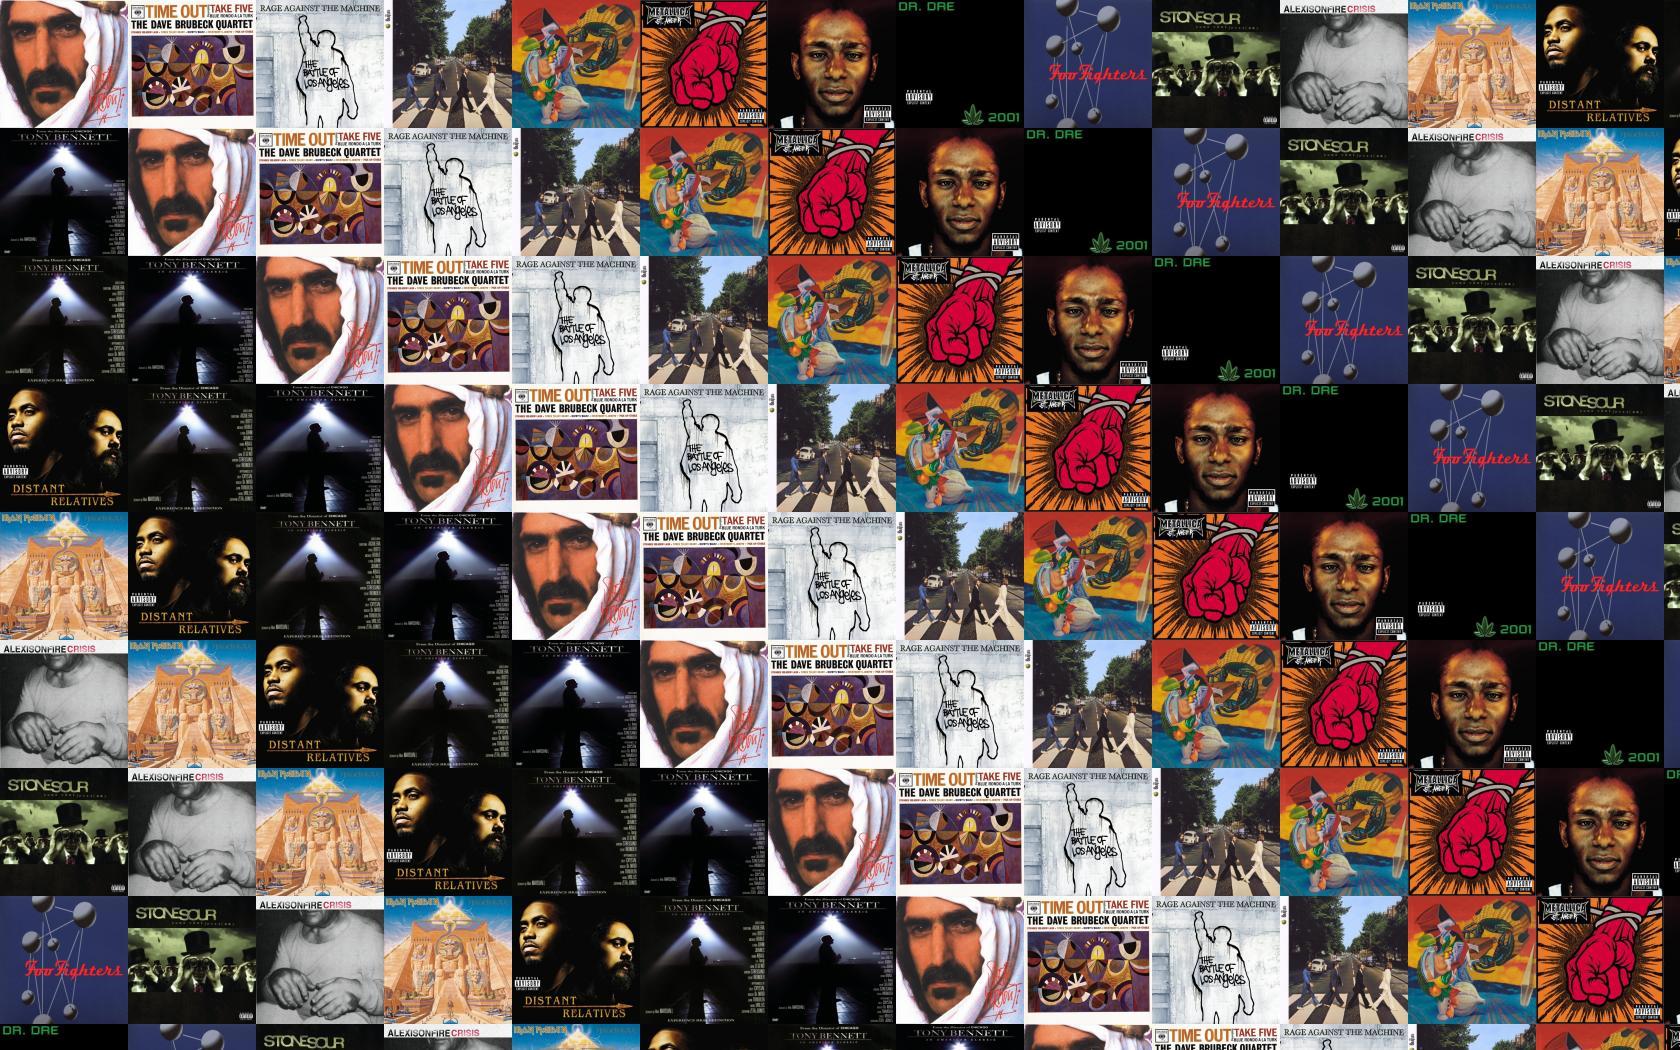 Frank Zappa Sheik Yerbouti Dave Brubeck Time Out Wallpaper